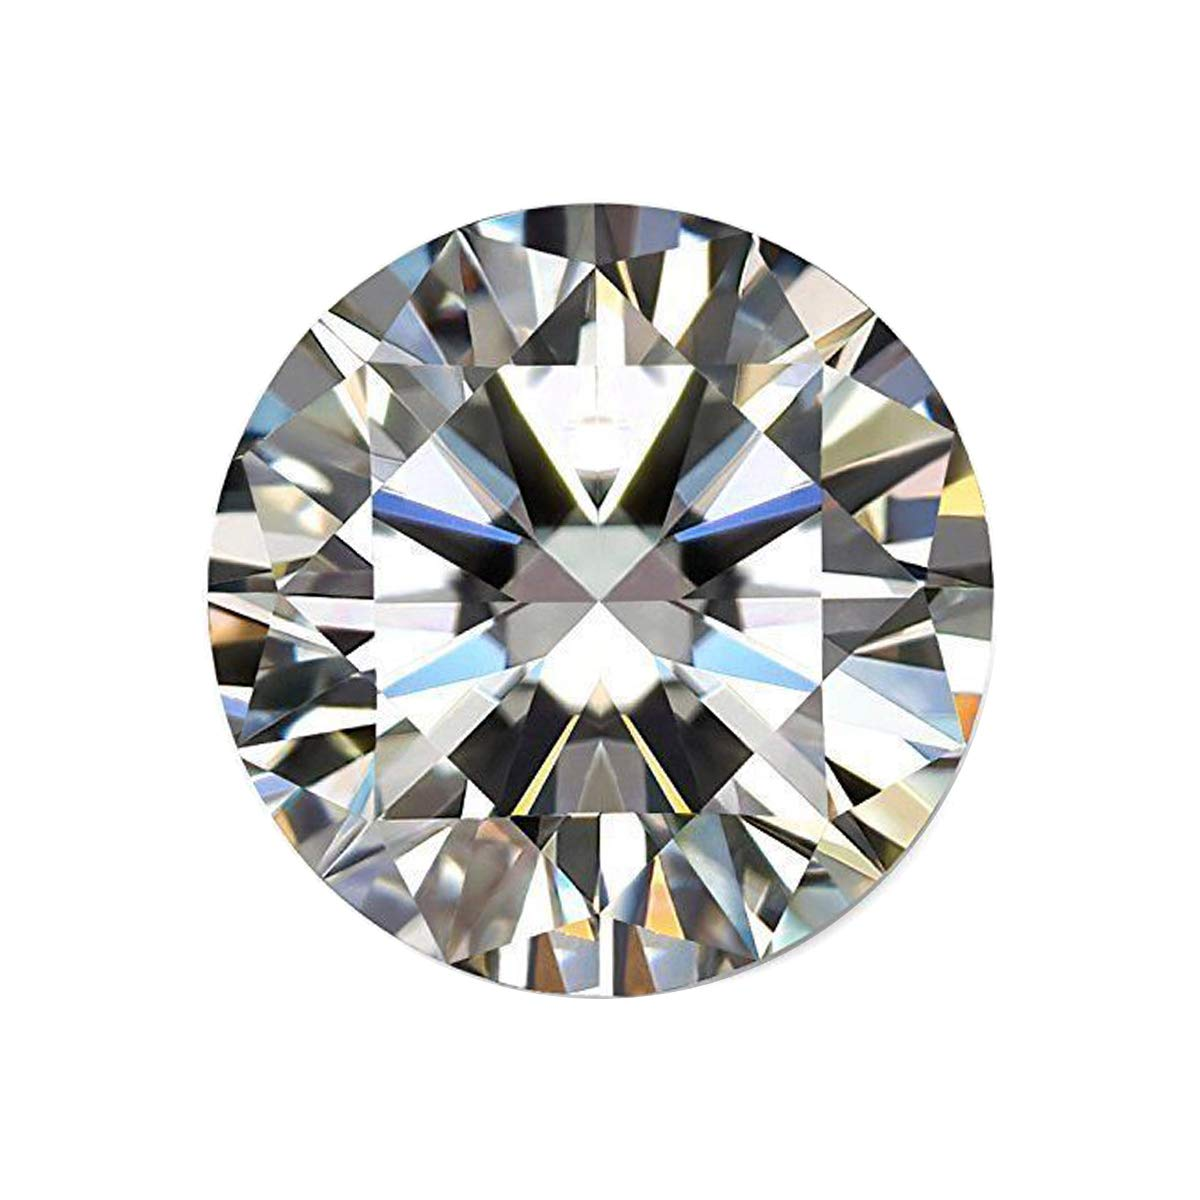 Genuine Moissanite Diamond 1.15 Ct Color DF White Moissanite Diamond Loose Stone Excellent Cut VVS1 Clarity Moissanite